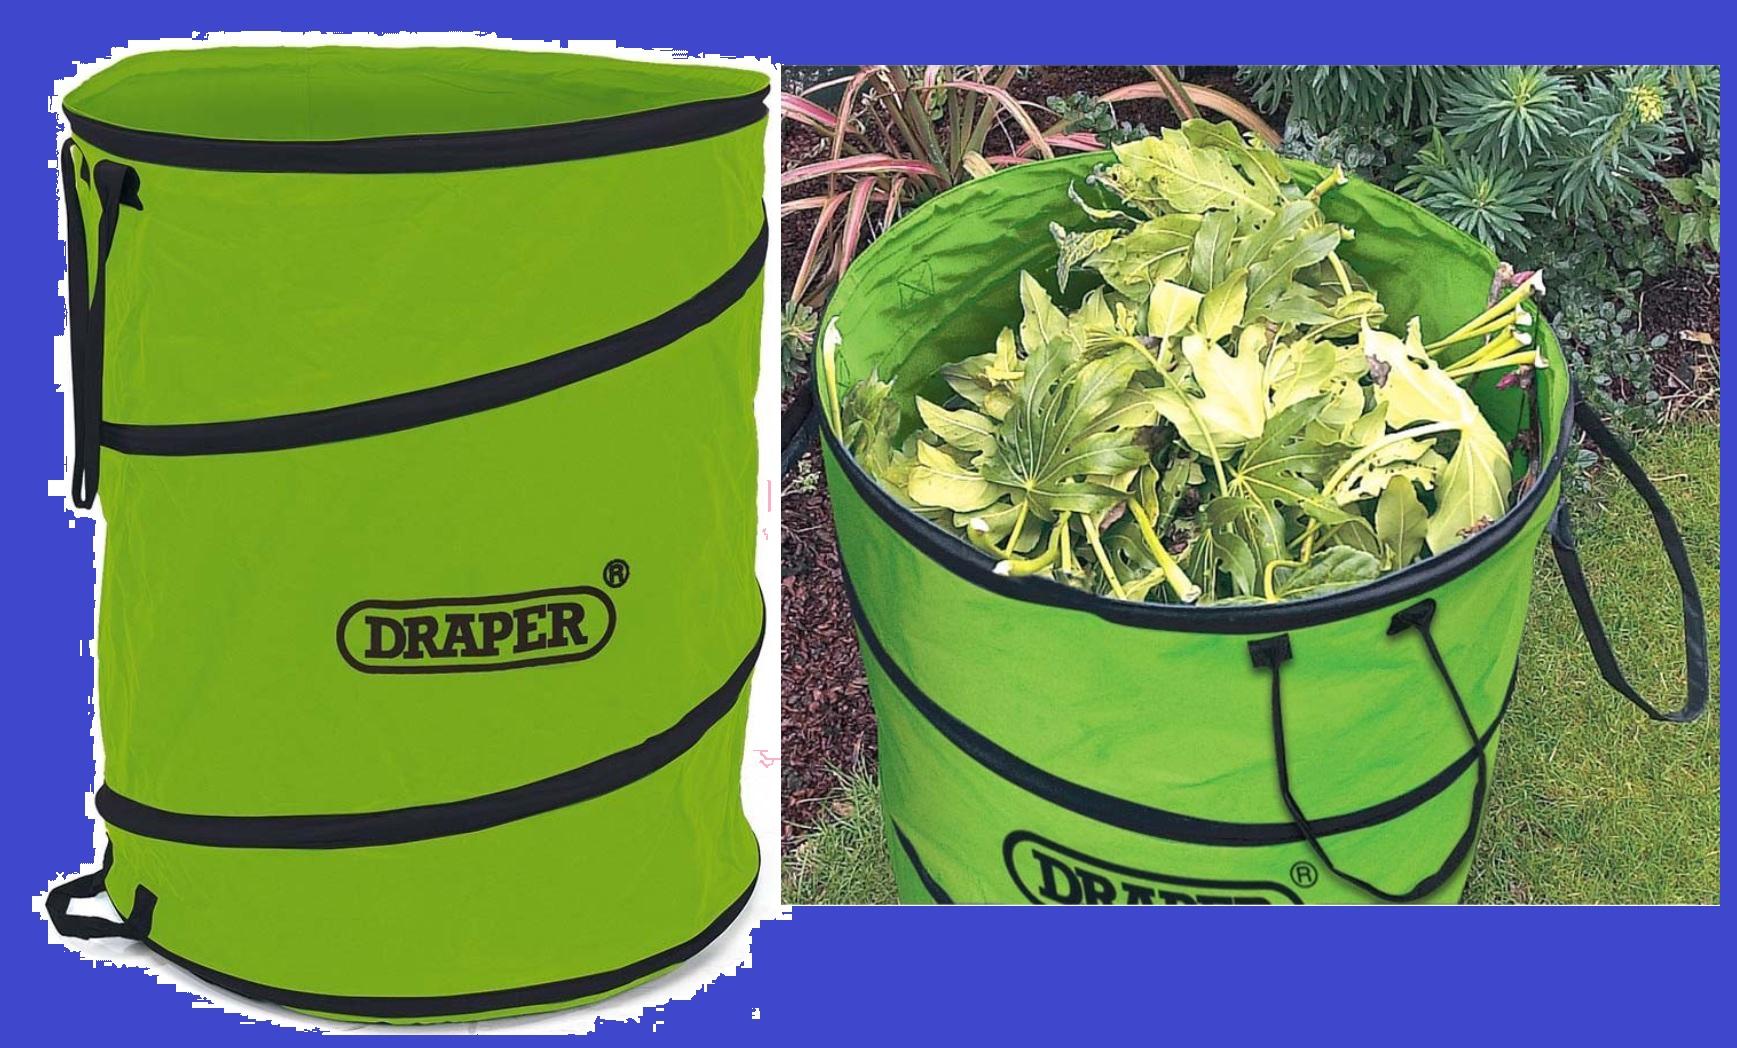 Draper 160L Garden Pop Up Tidy Bag - Green for £6.74 w/code  Free C&C @ RobertDyas